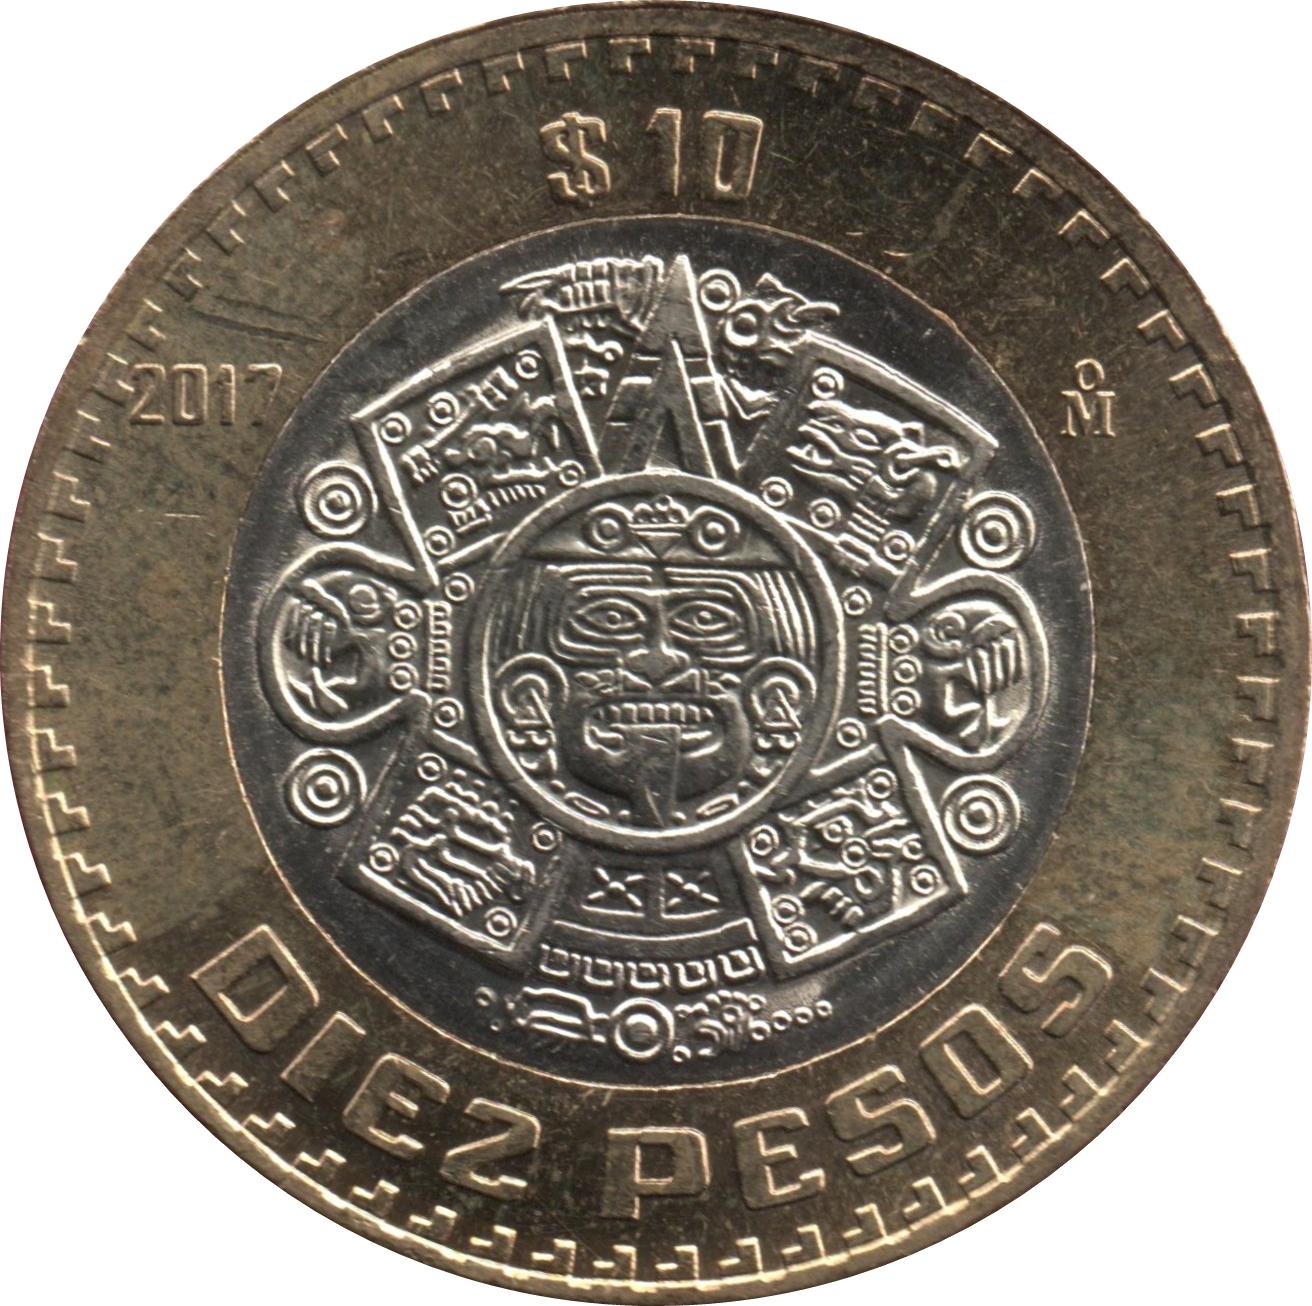 Mexico P-58i 10 Pesos Year 8.11.1961 Uncirculated Banknote